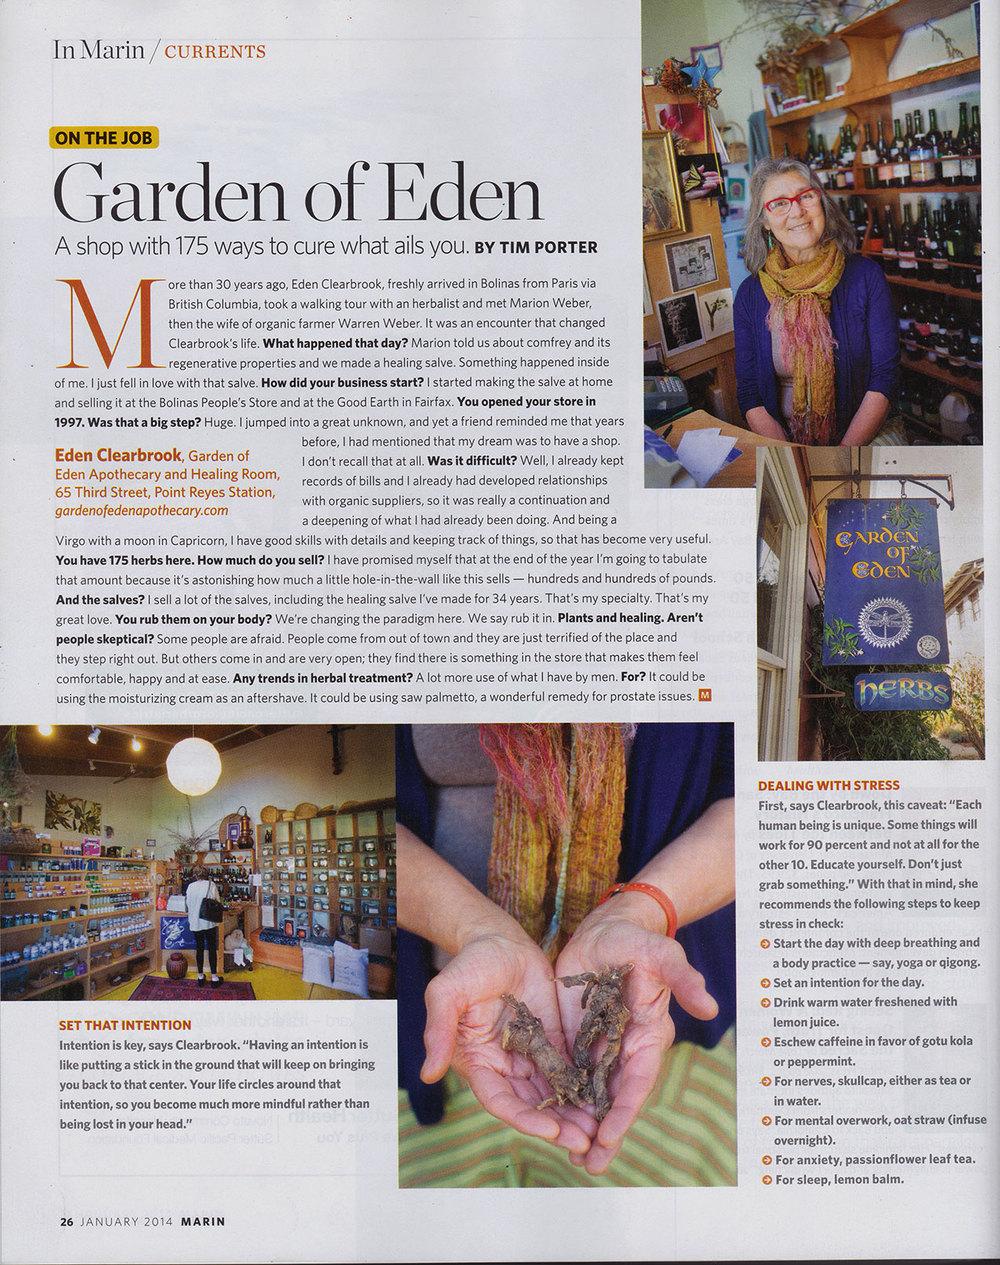 GardenofEden-MarinMagazine.jpg